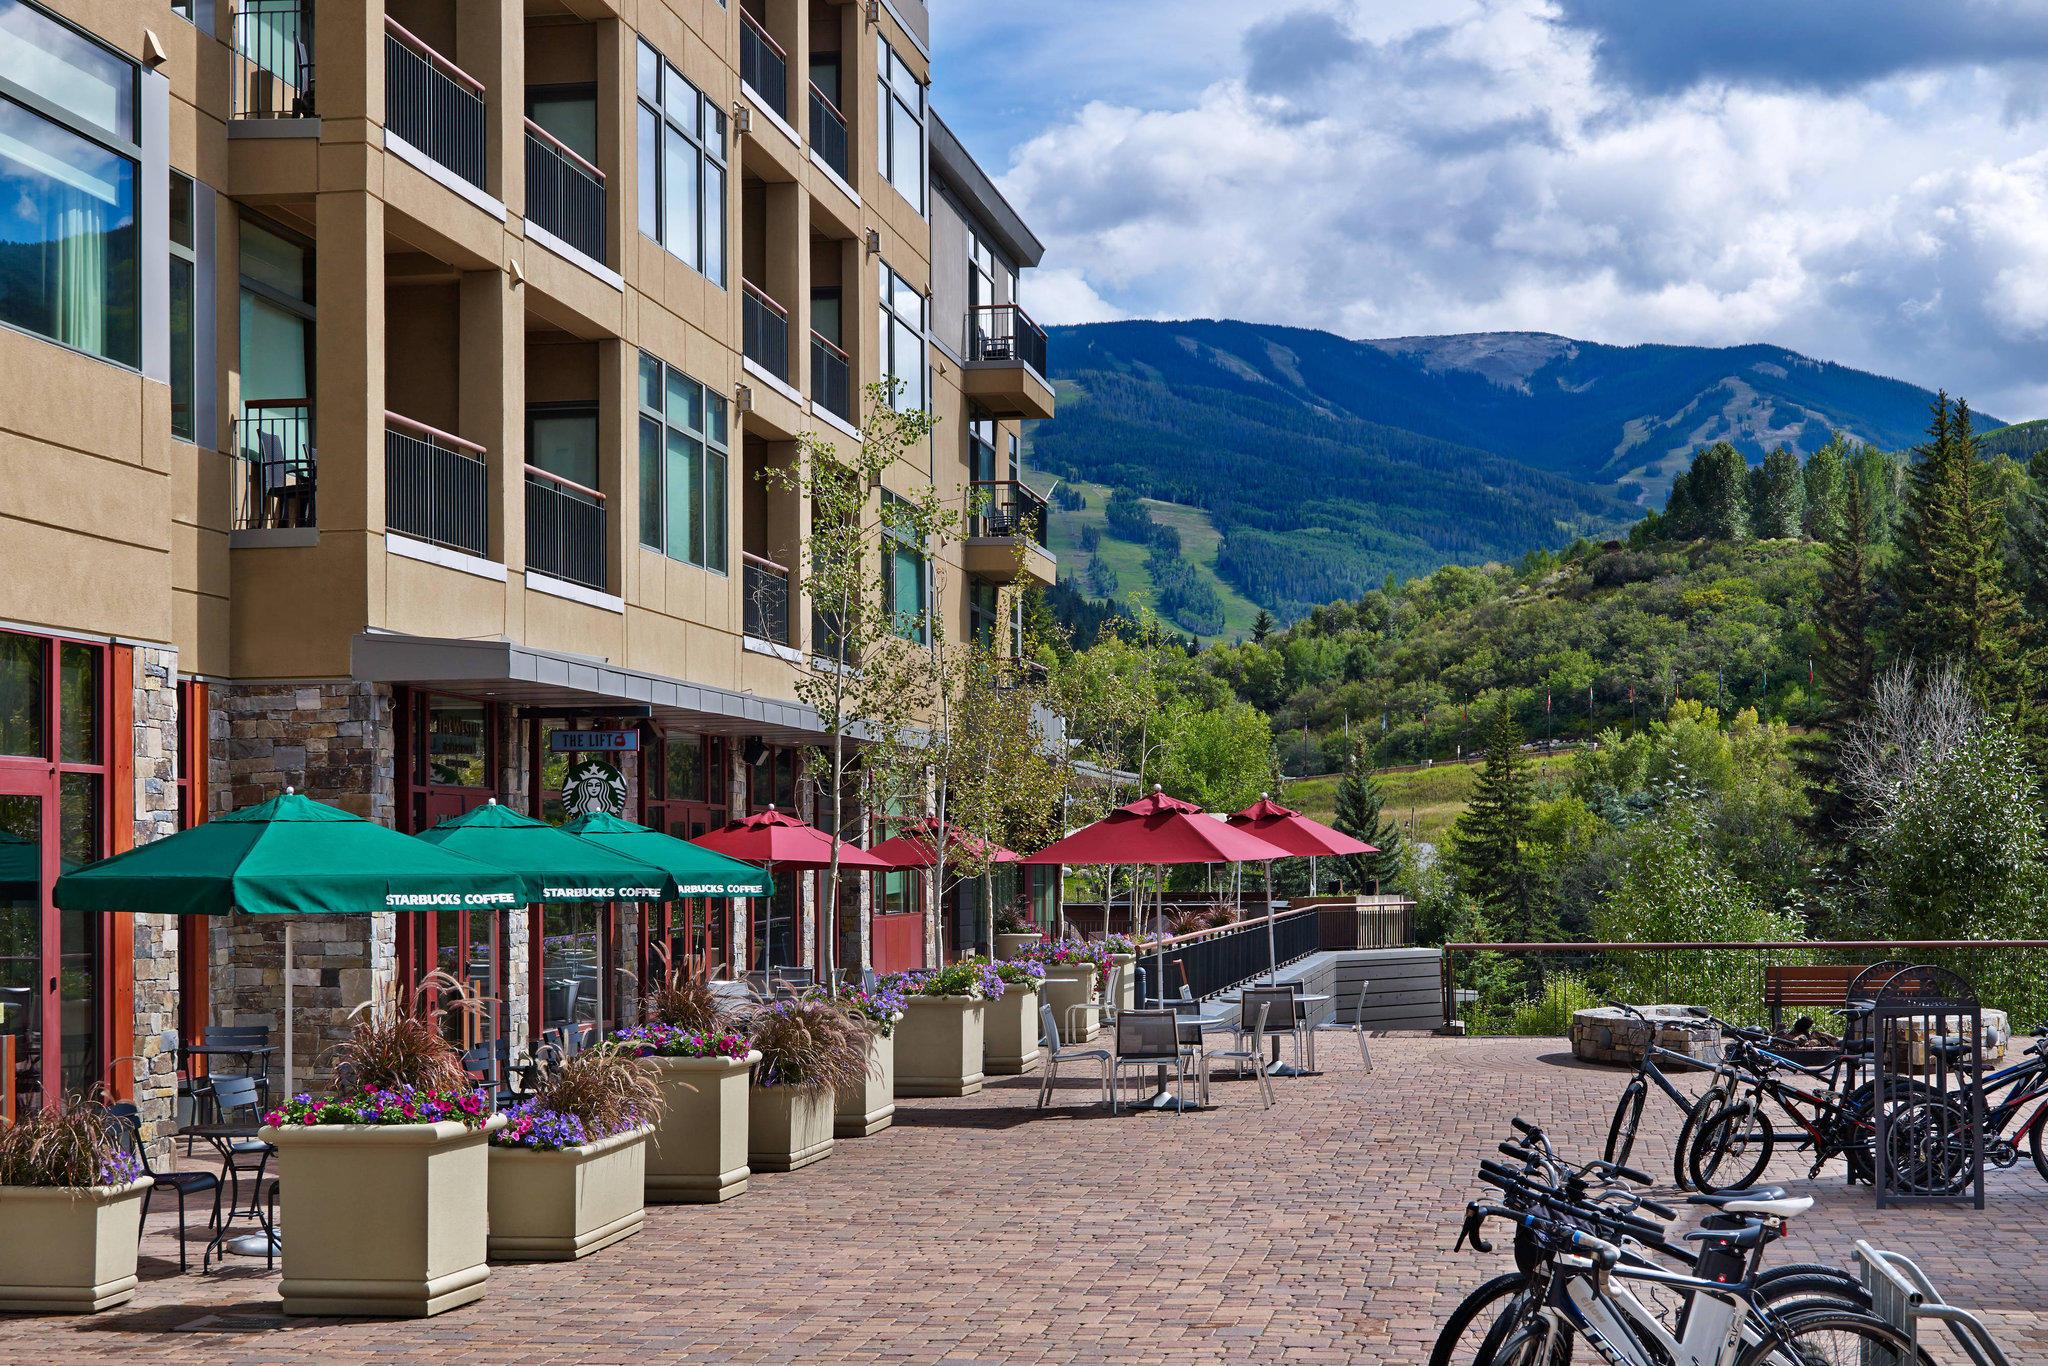 The Westin Riverfront Resort & Spa, Avon, Vail Valley